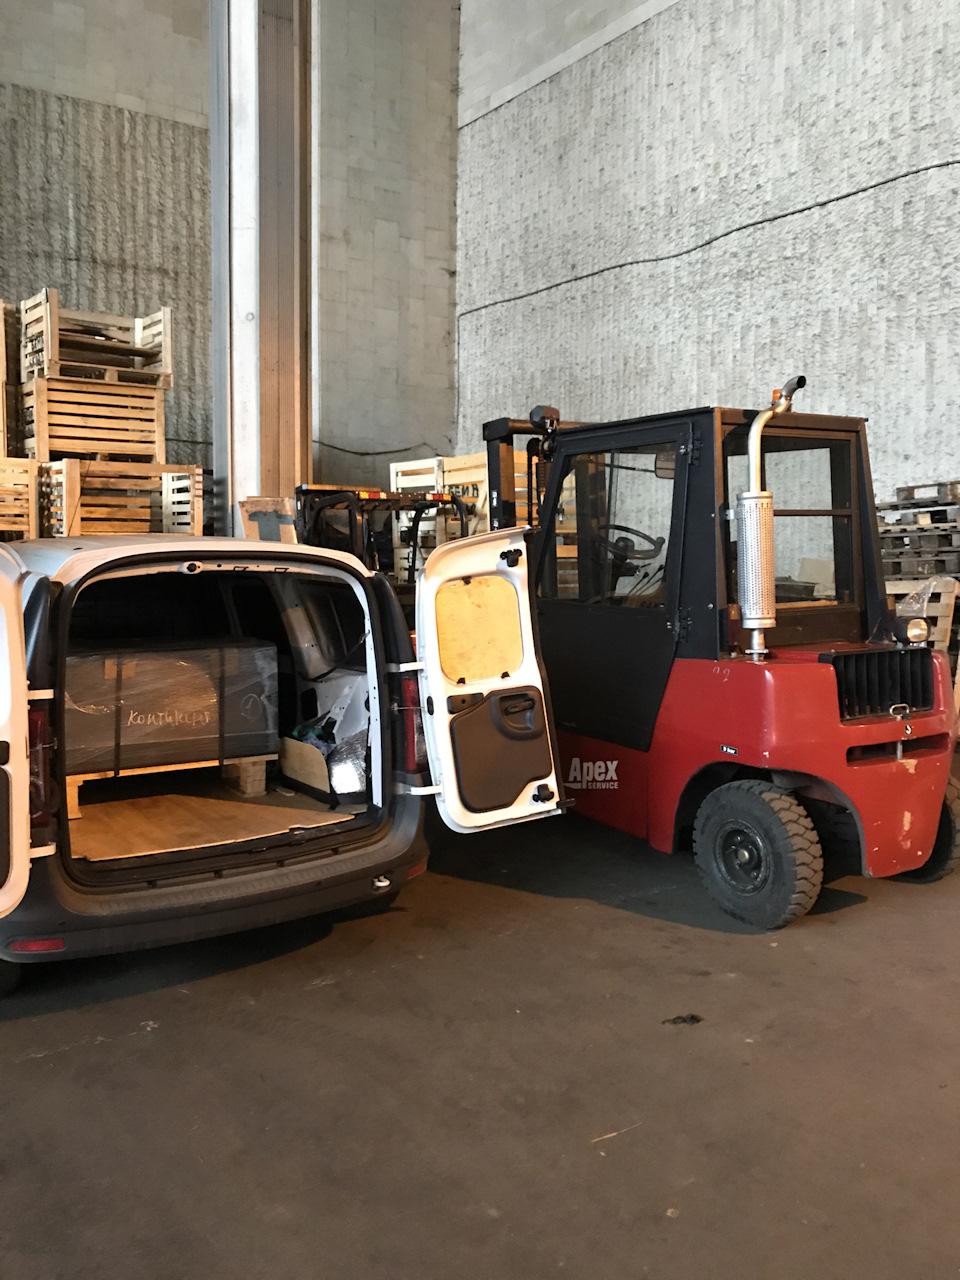 Что входит в багажник Лада Ларгус фургон?